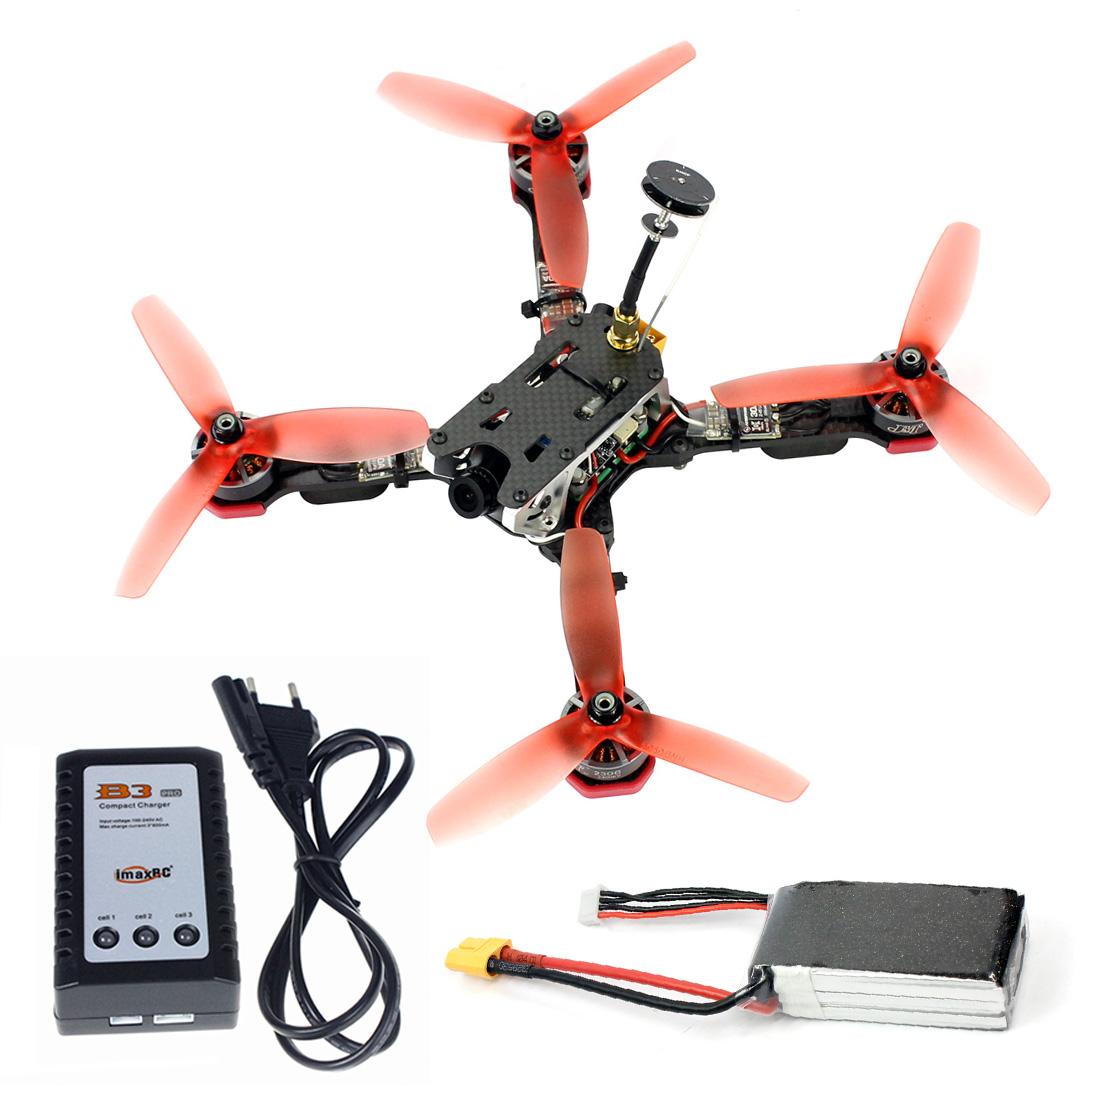 FPV Racer Drone DIY Quadcopter VTX Frog 218mm BNF/PNP Betaflight F4